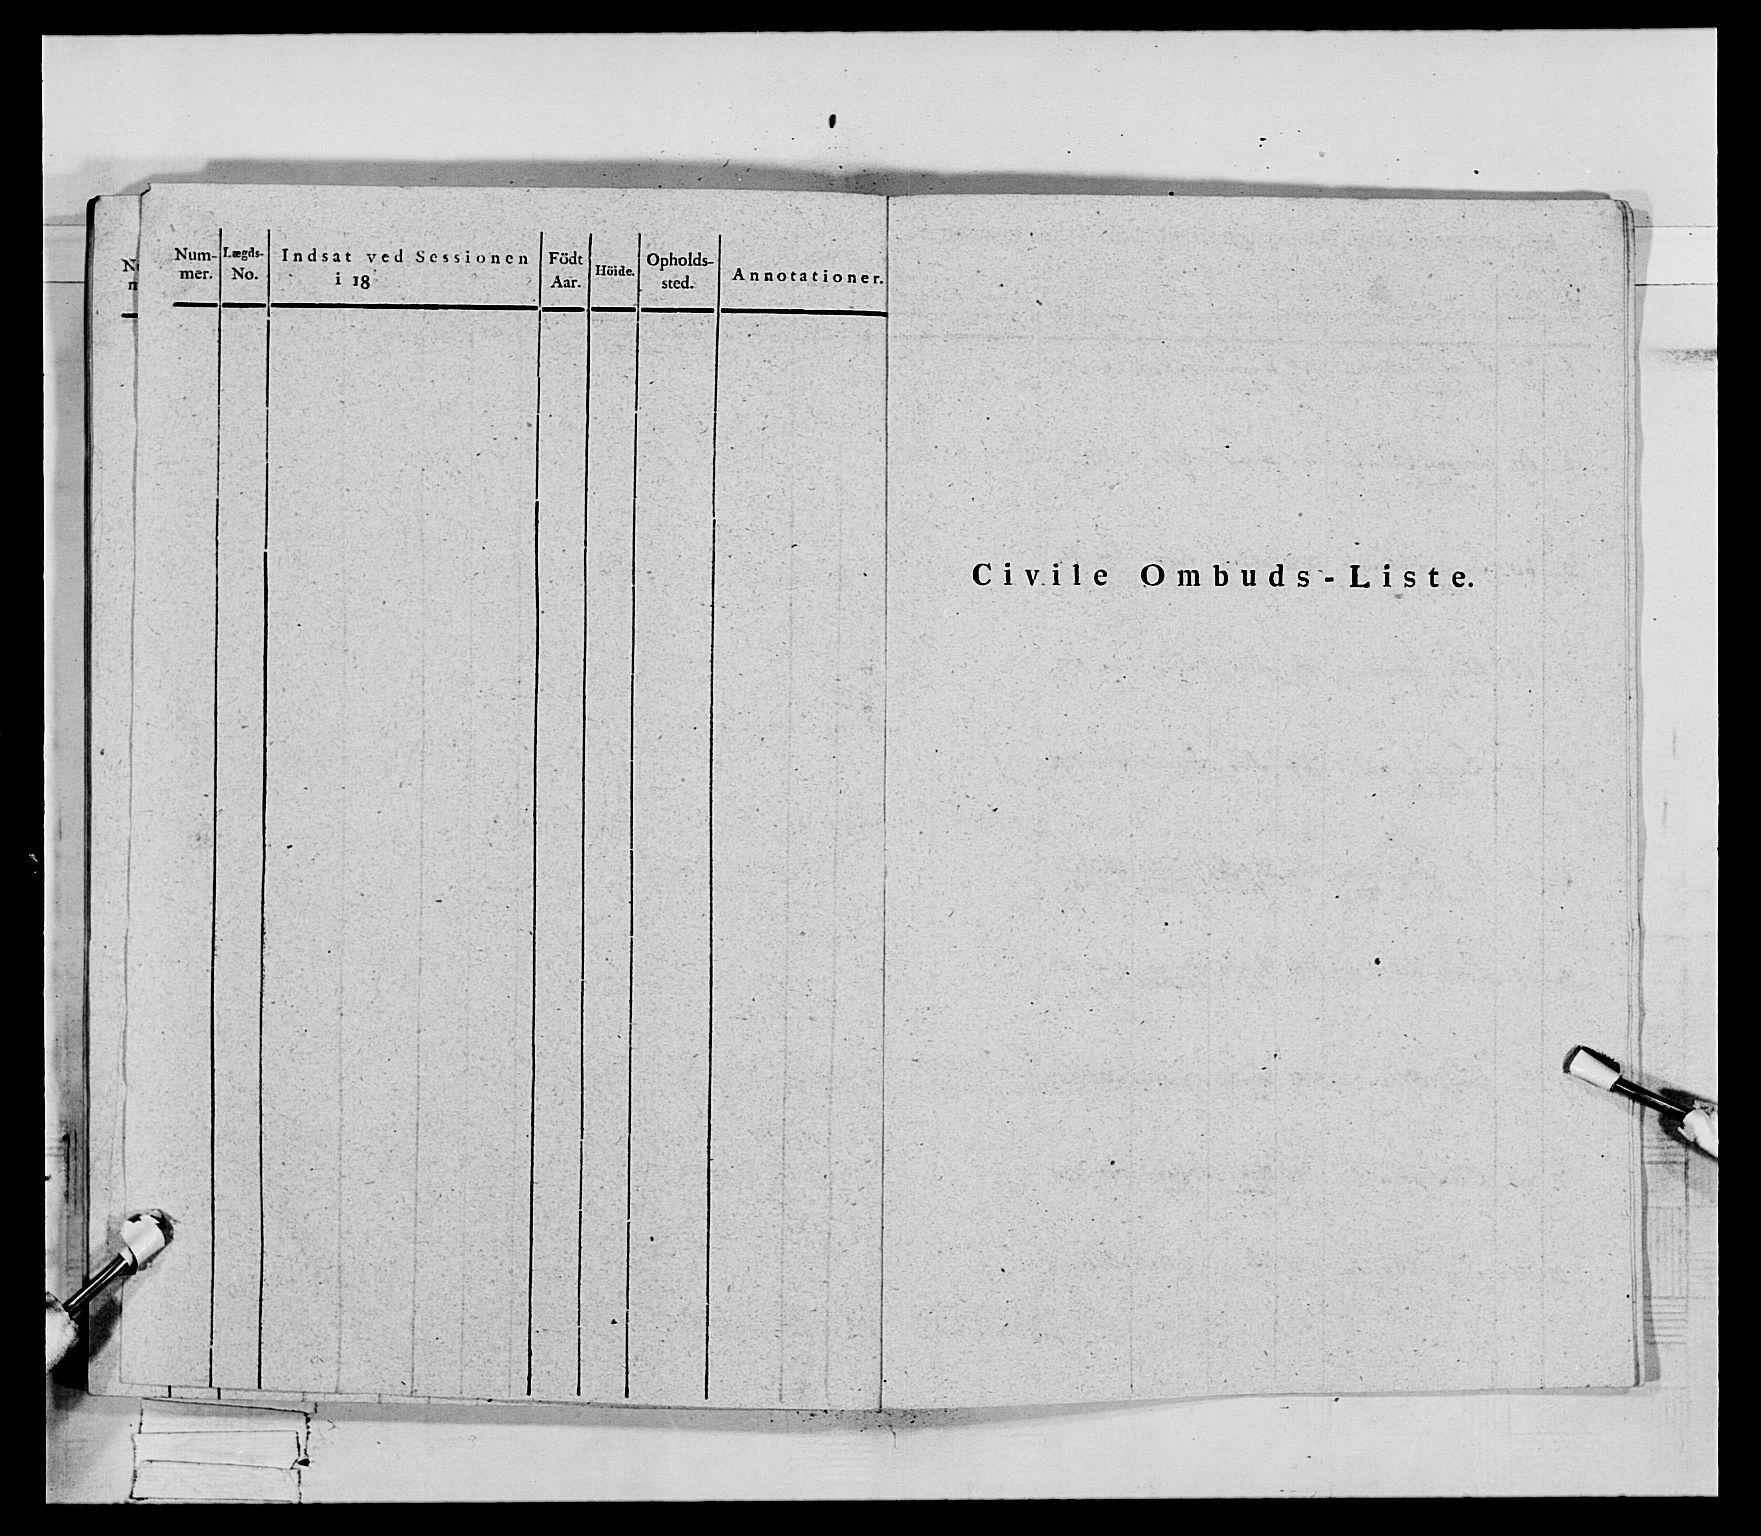 RA, Generalitets- og kommissariatskollegiet, Det kongelige norske kommissariatskollegium, E/Eh/L0069: Opplandske gevorbne infanteriregiment, 1810-1818, s. 564